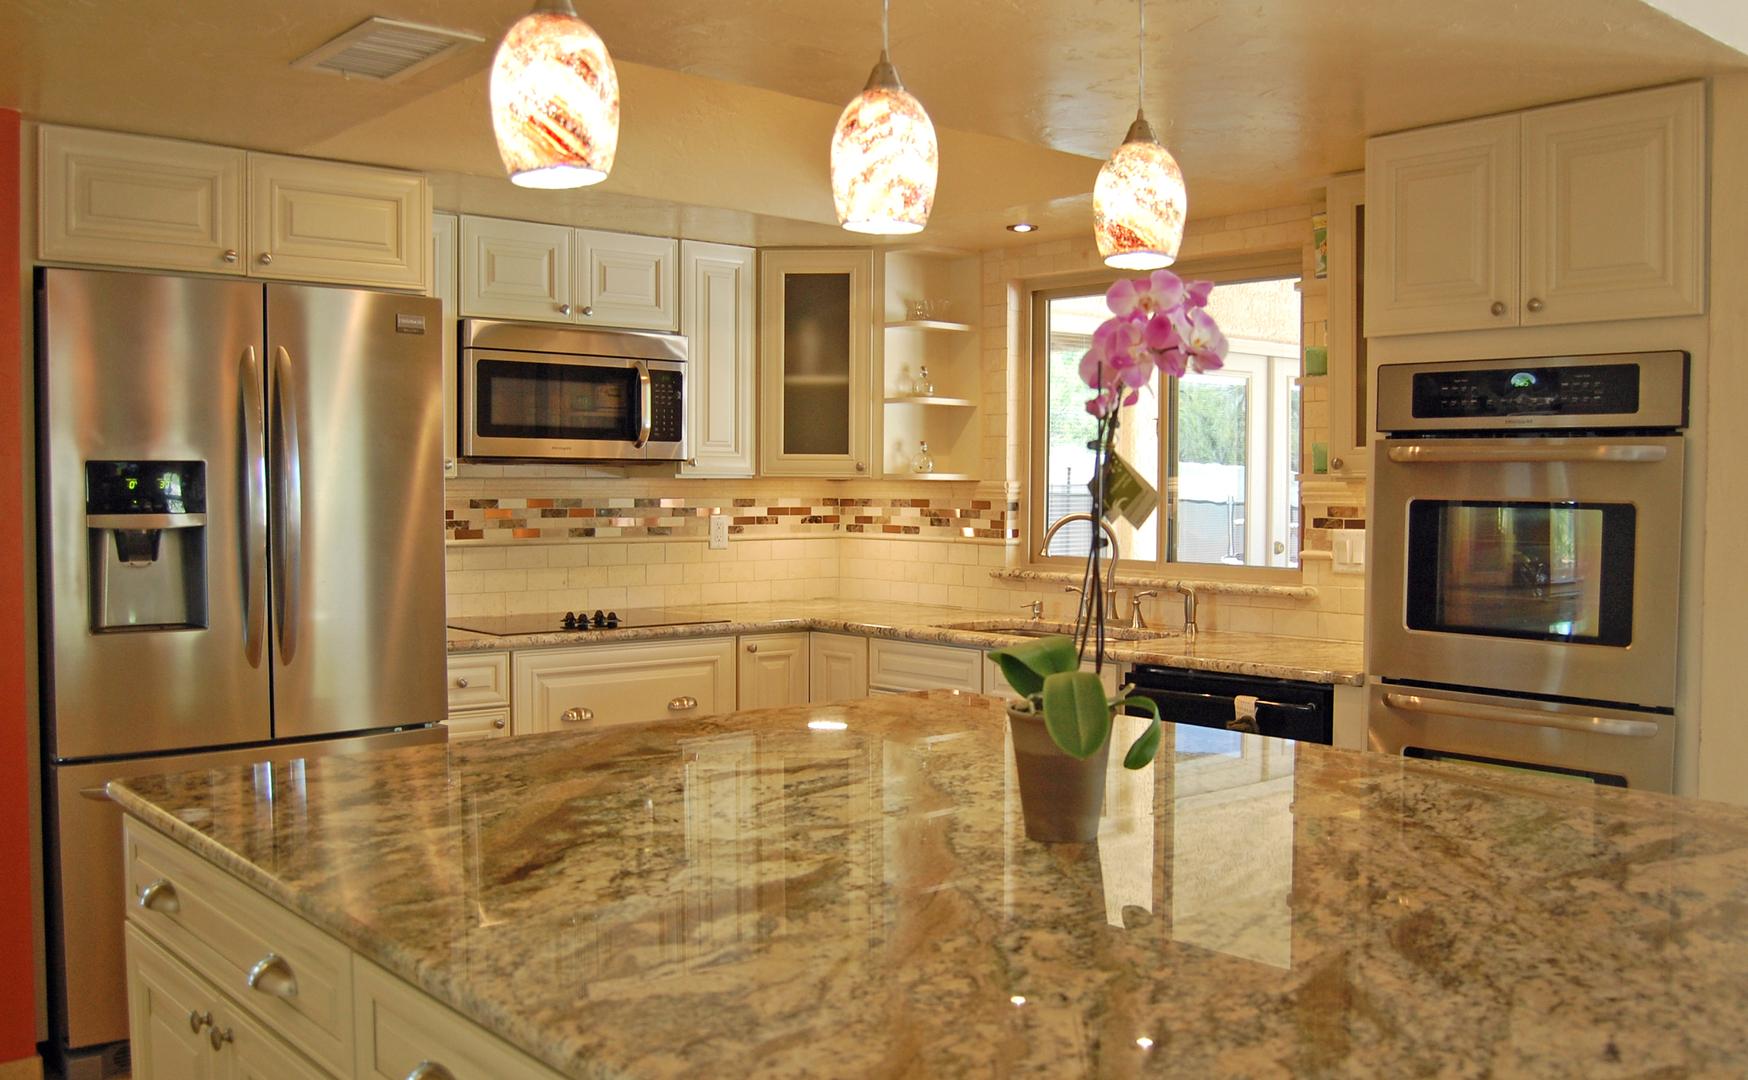 residential gallery kitchen remodel tucson Kitchen Remodel Northwest Tucson